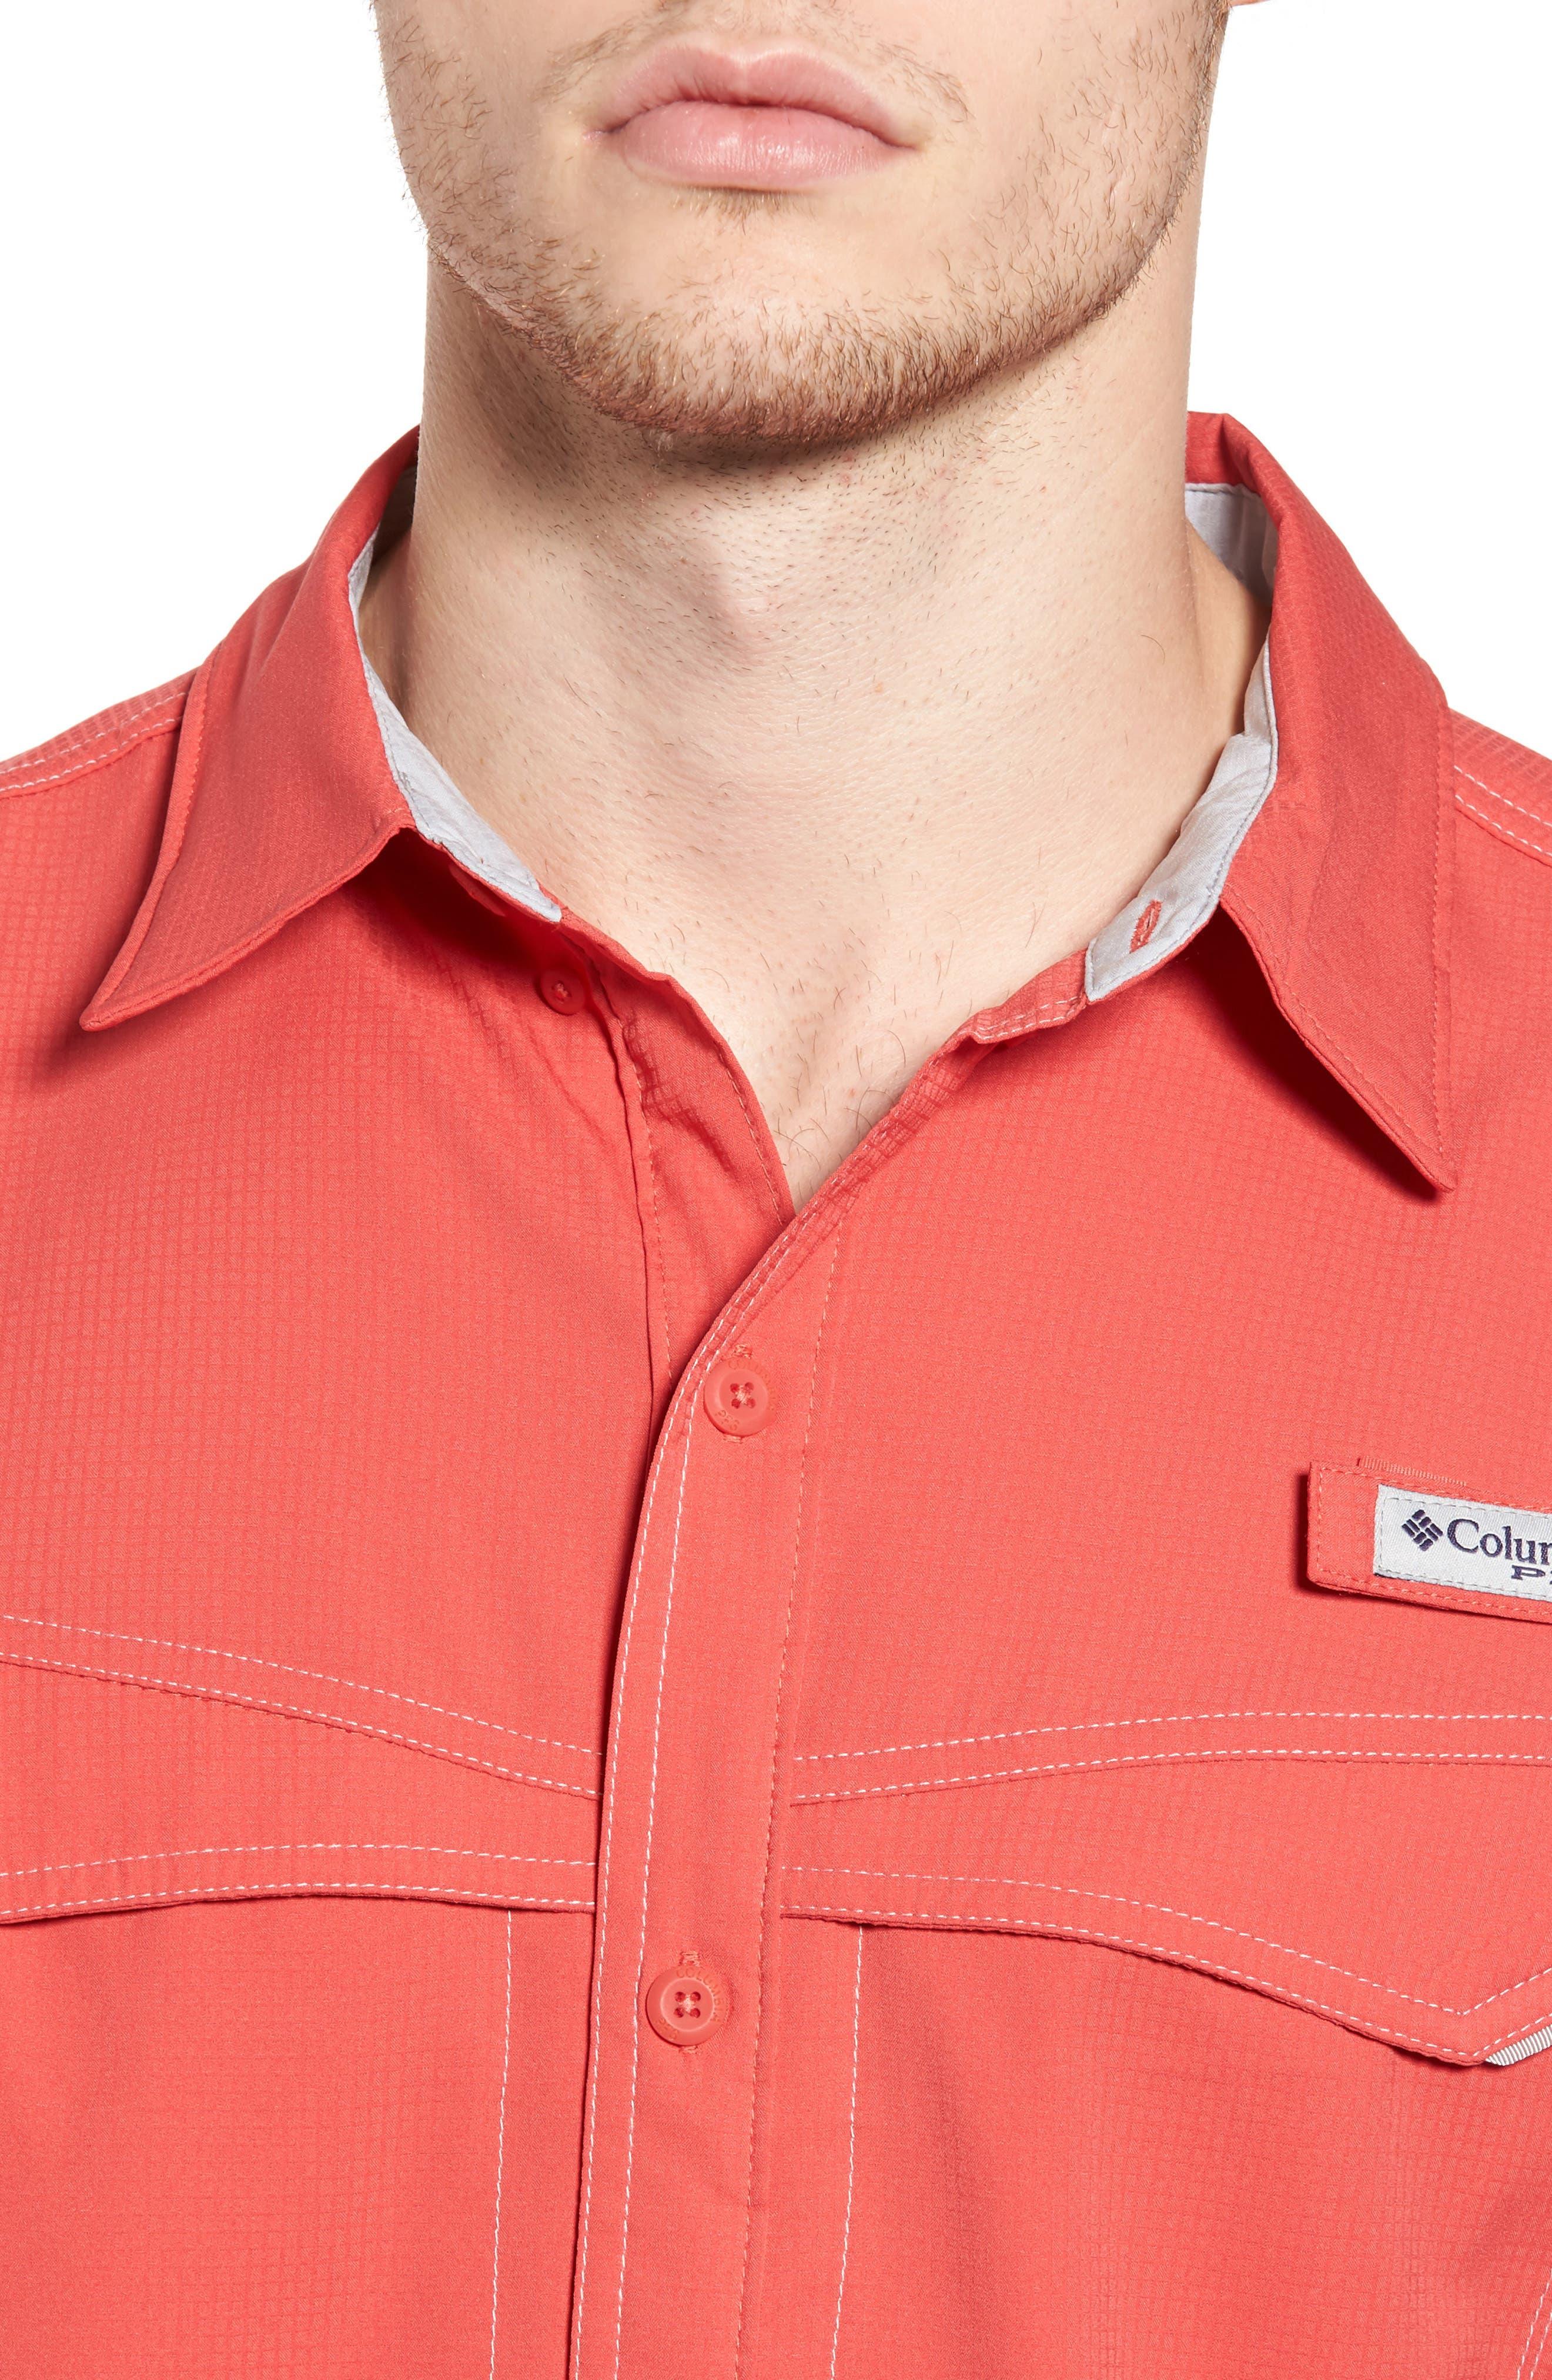 PFG Low Drag Offshore Woven Shirt,                             Alternate thumbnail 19, color,